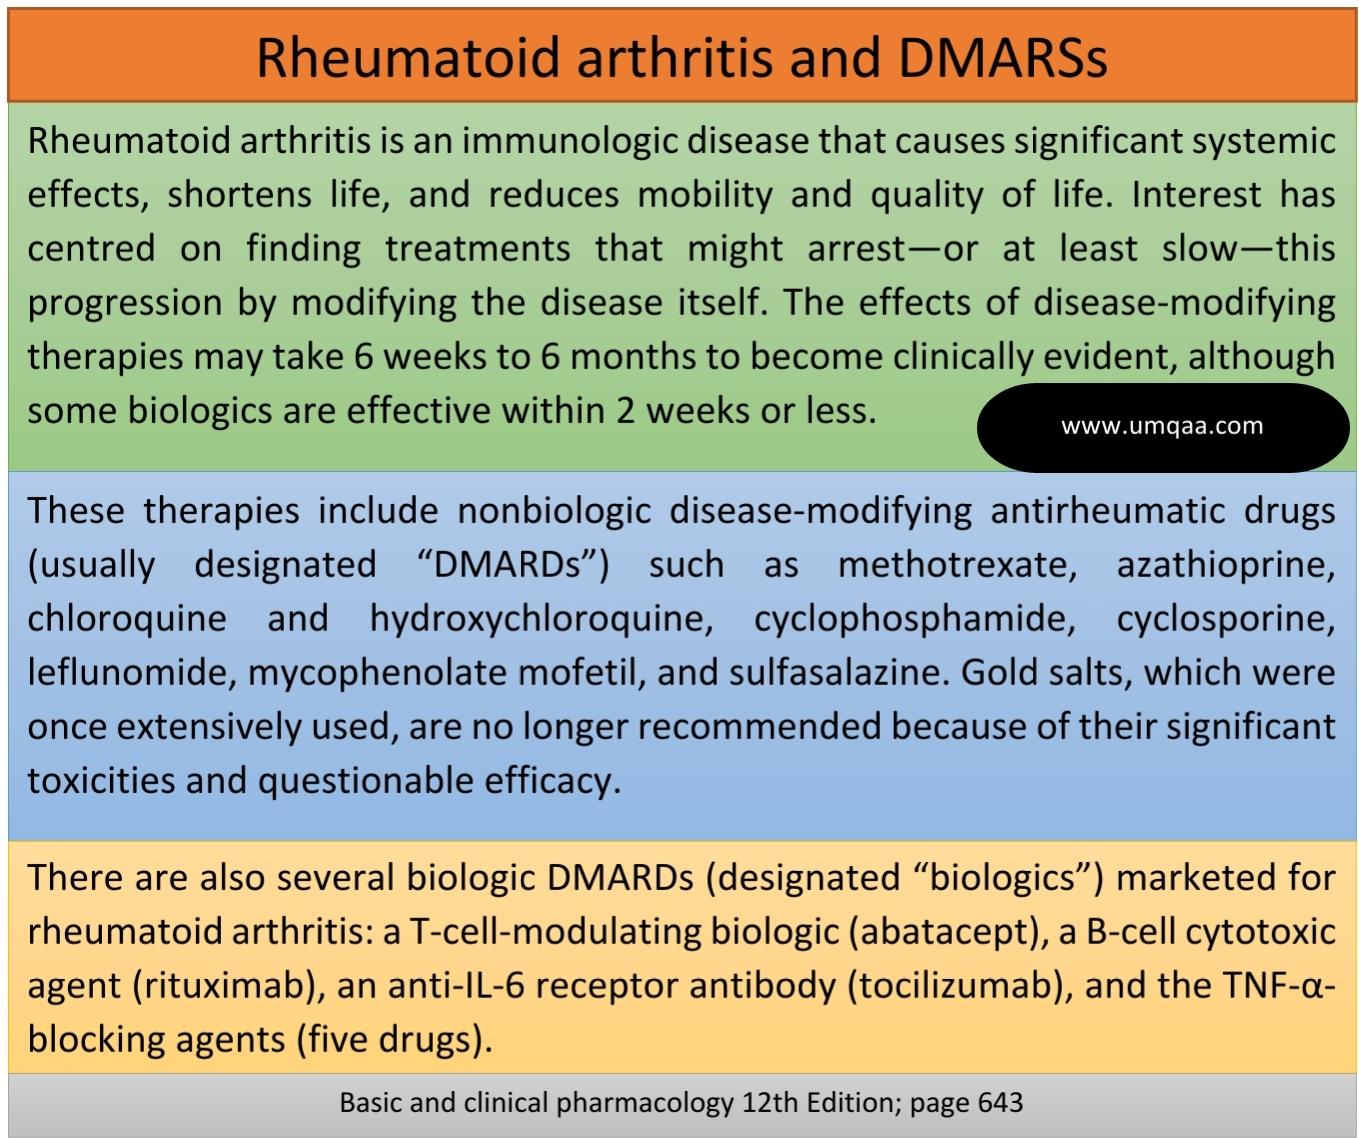 DMARDs-Disease-modifying antirheumatic drugs